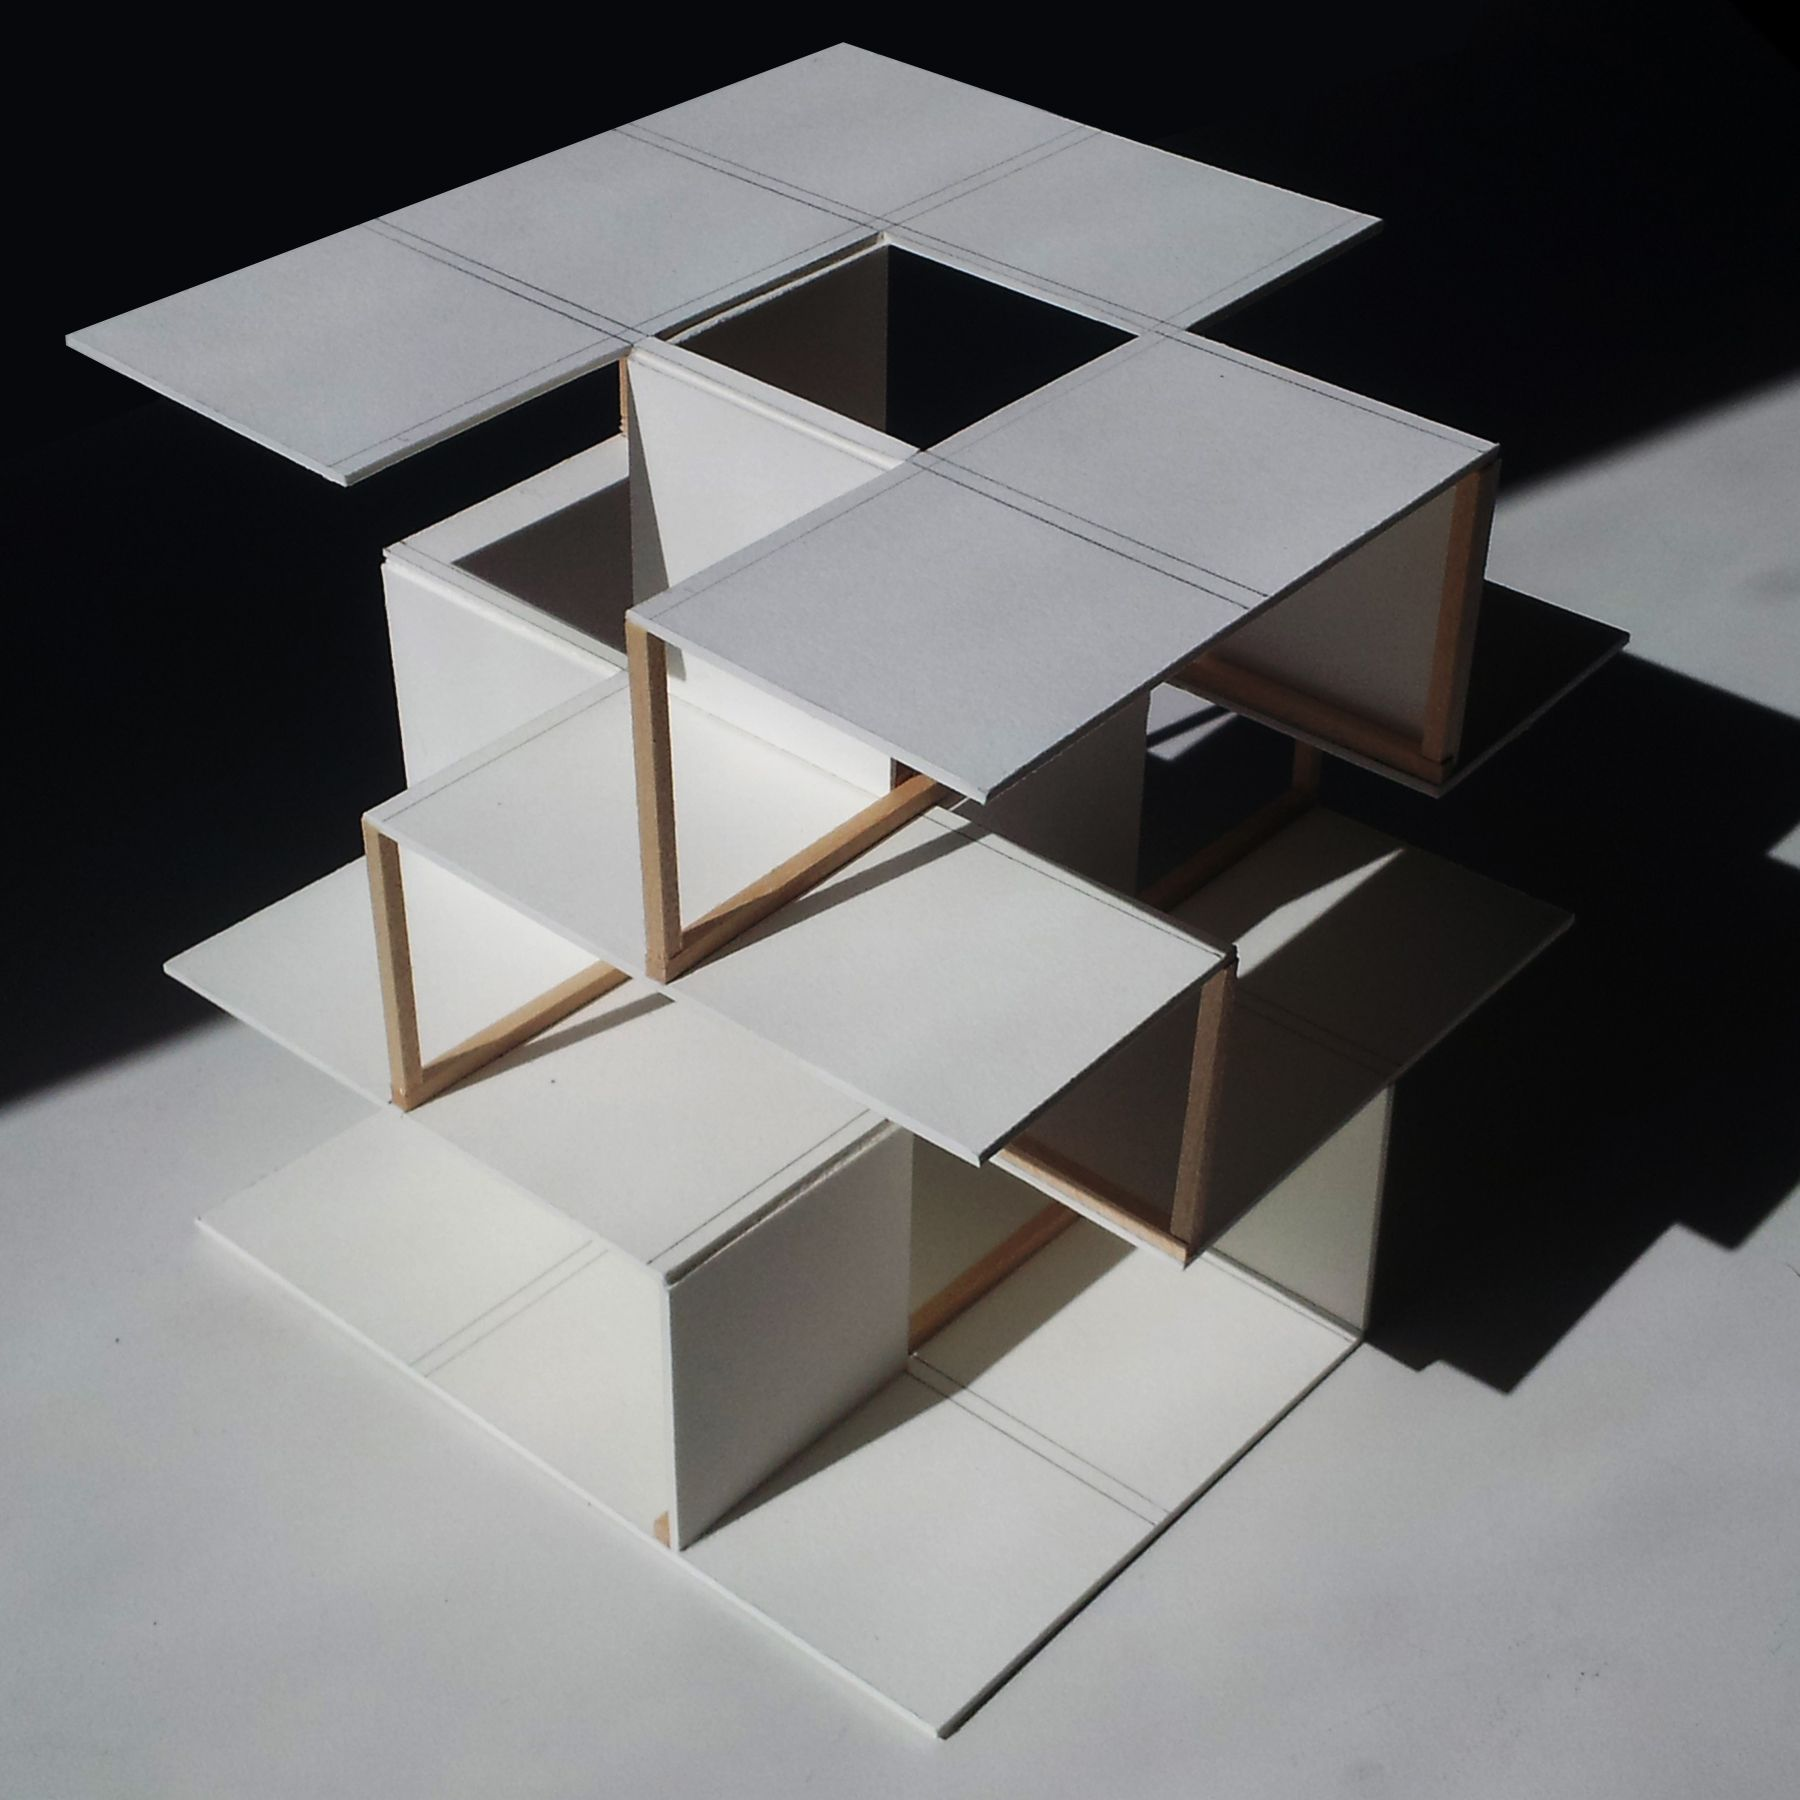 Tabak Travis 1 Studio Miller And Munly Concept Models Architecture Concept Architecture Architecture Model